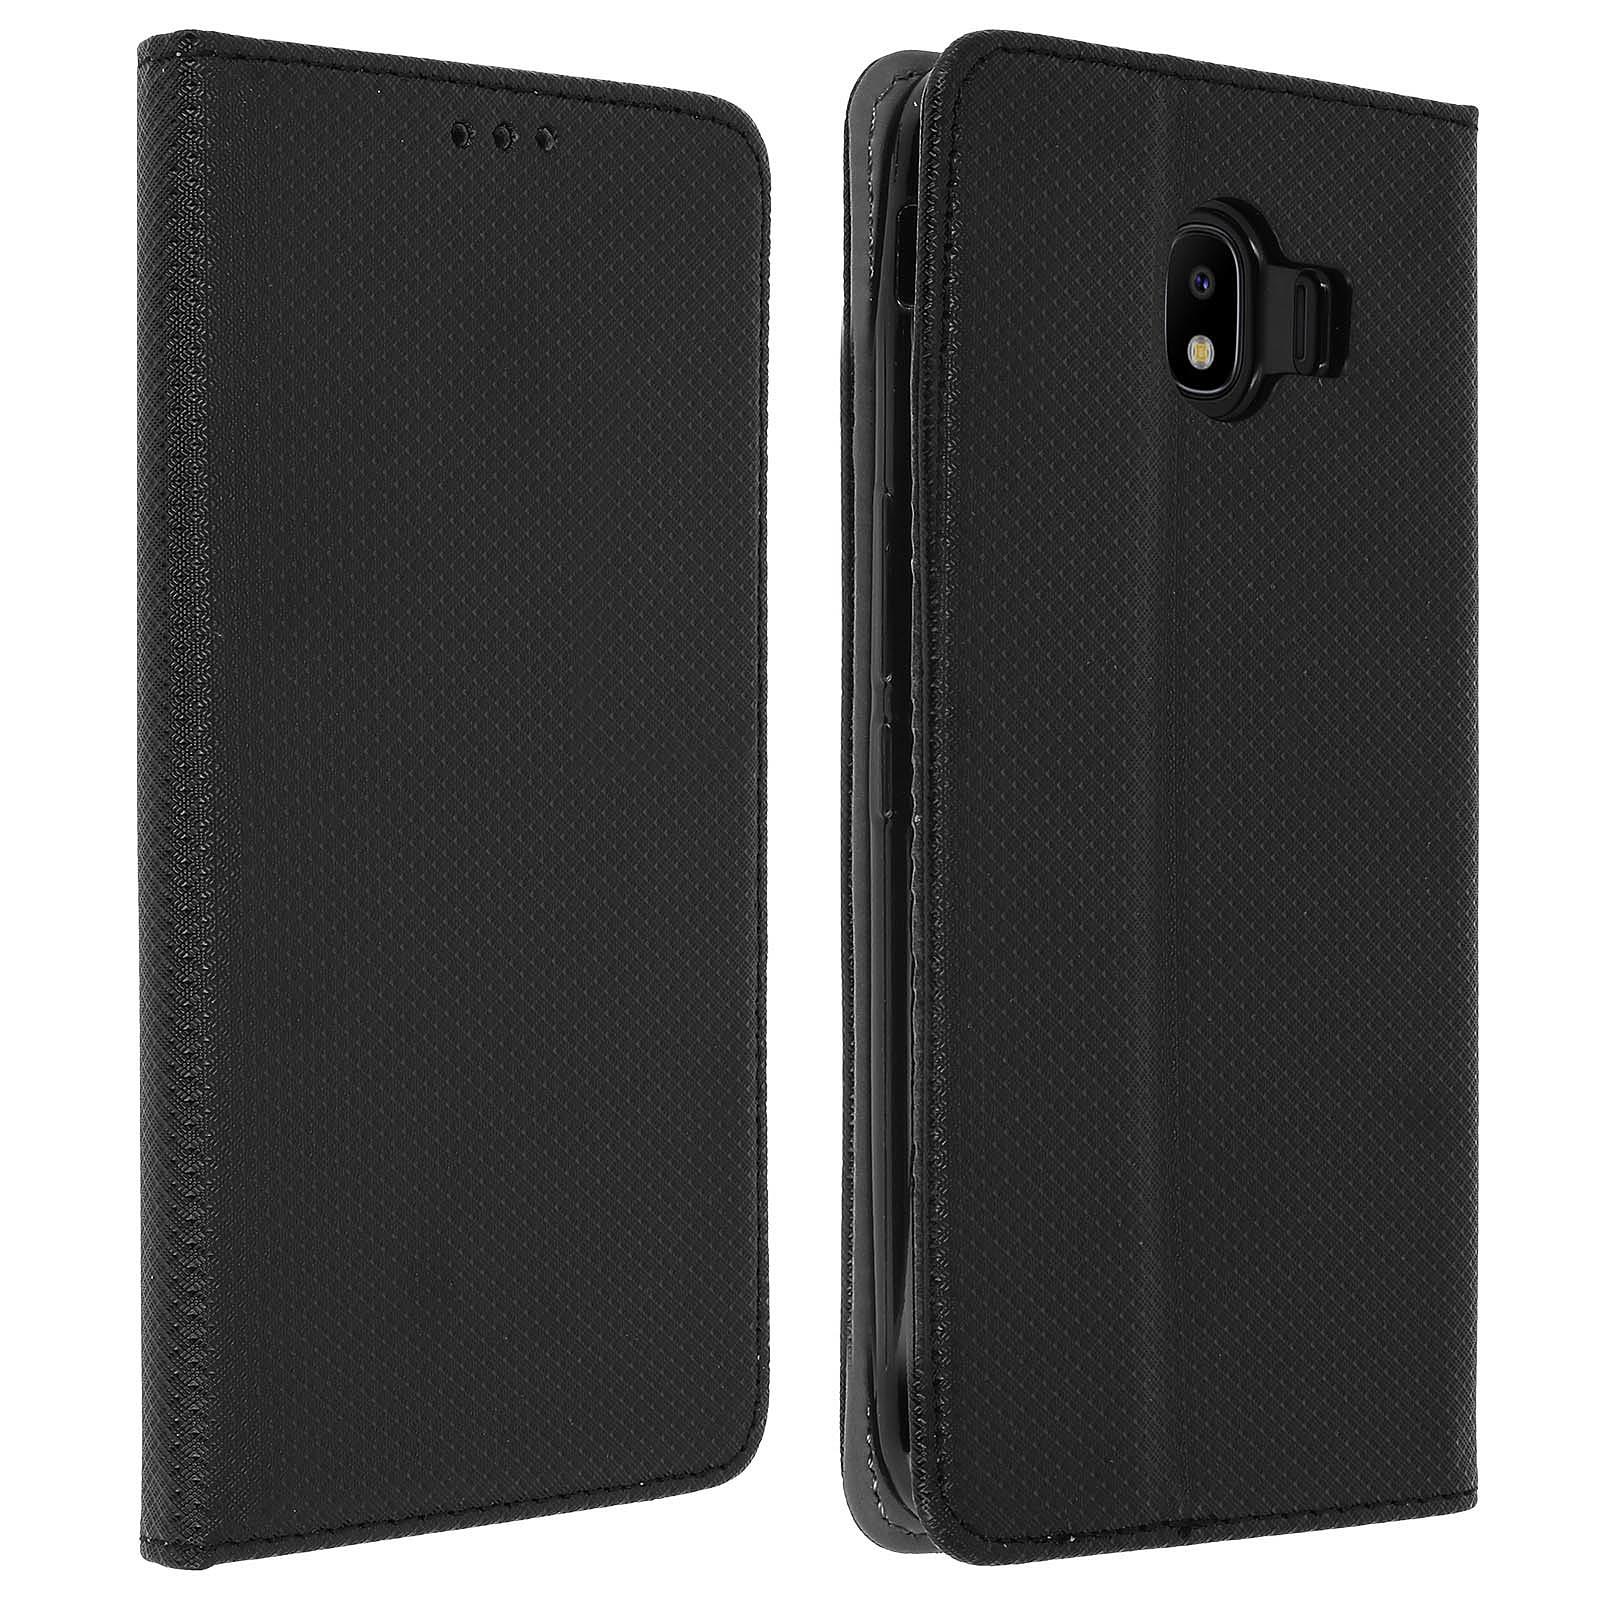 Avizar Etui folio Noir pour Samsung Galaxy J4